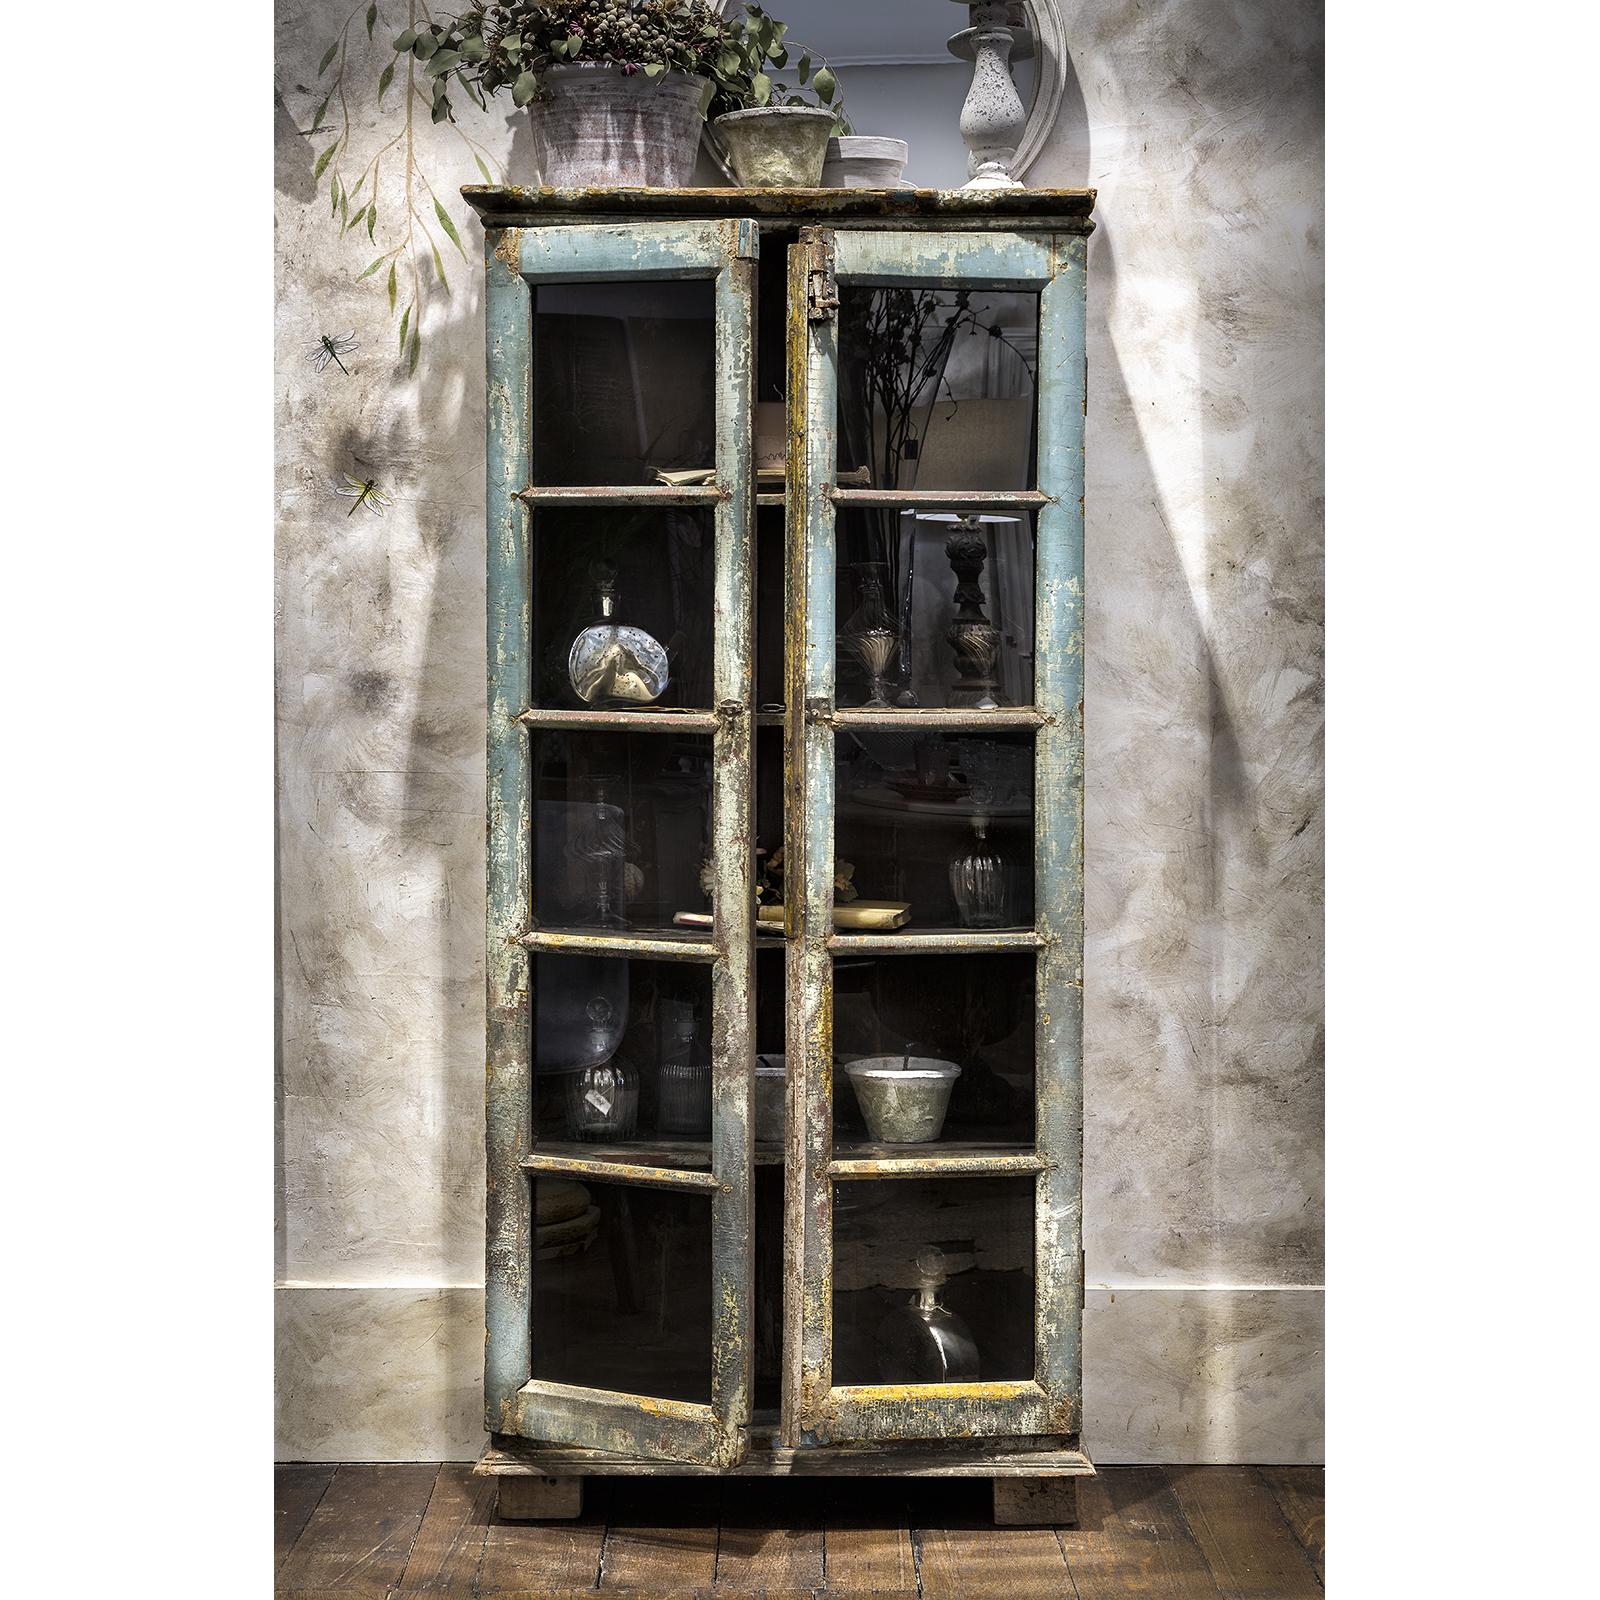 Mueble vitrina platero antiguo con decapado sandra for Mueble platero